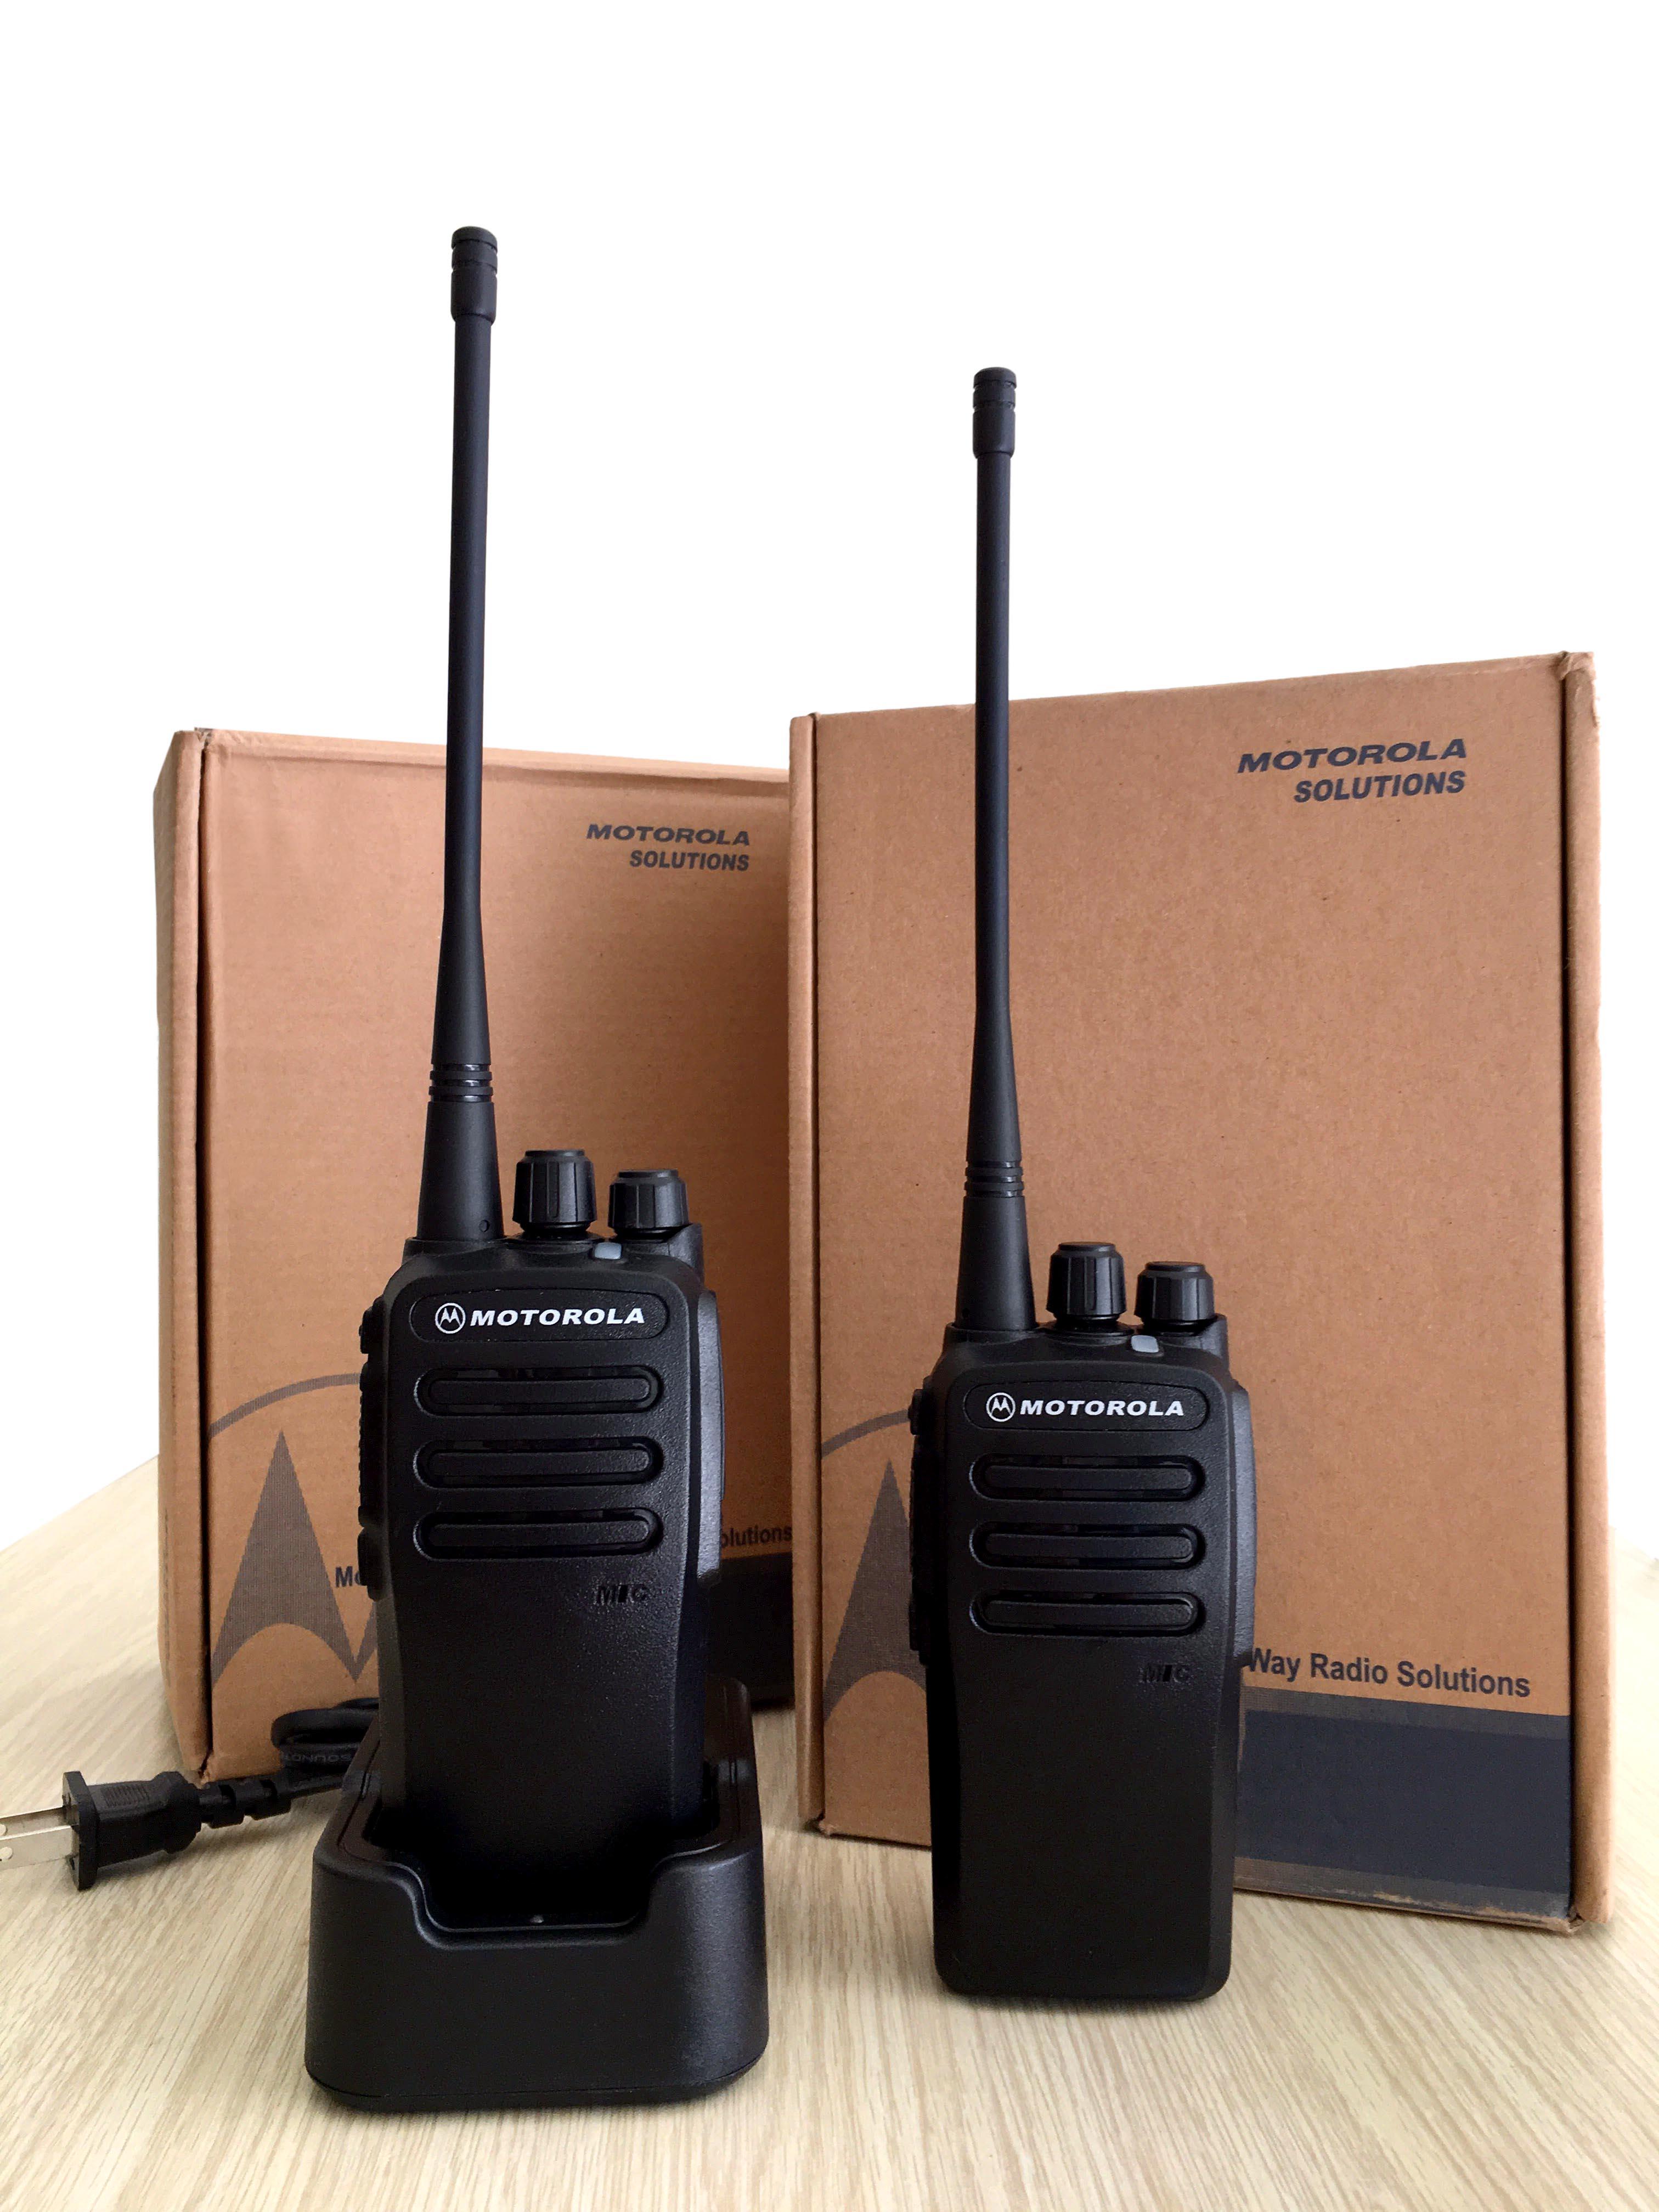 Bộ đàm Motorola GP 3588 Plus(Đen) - Công suất lớn 12W